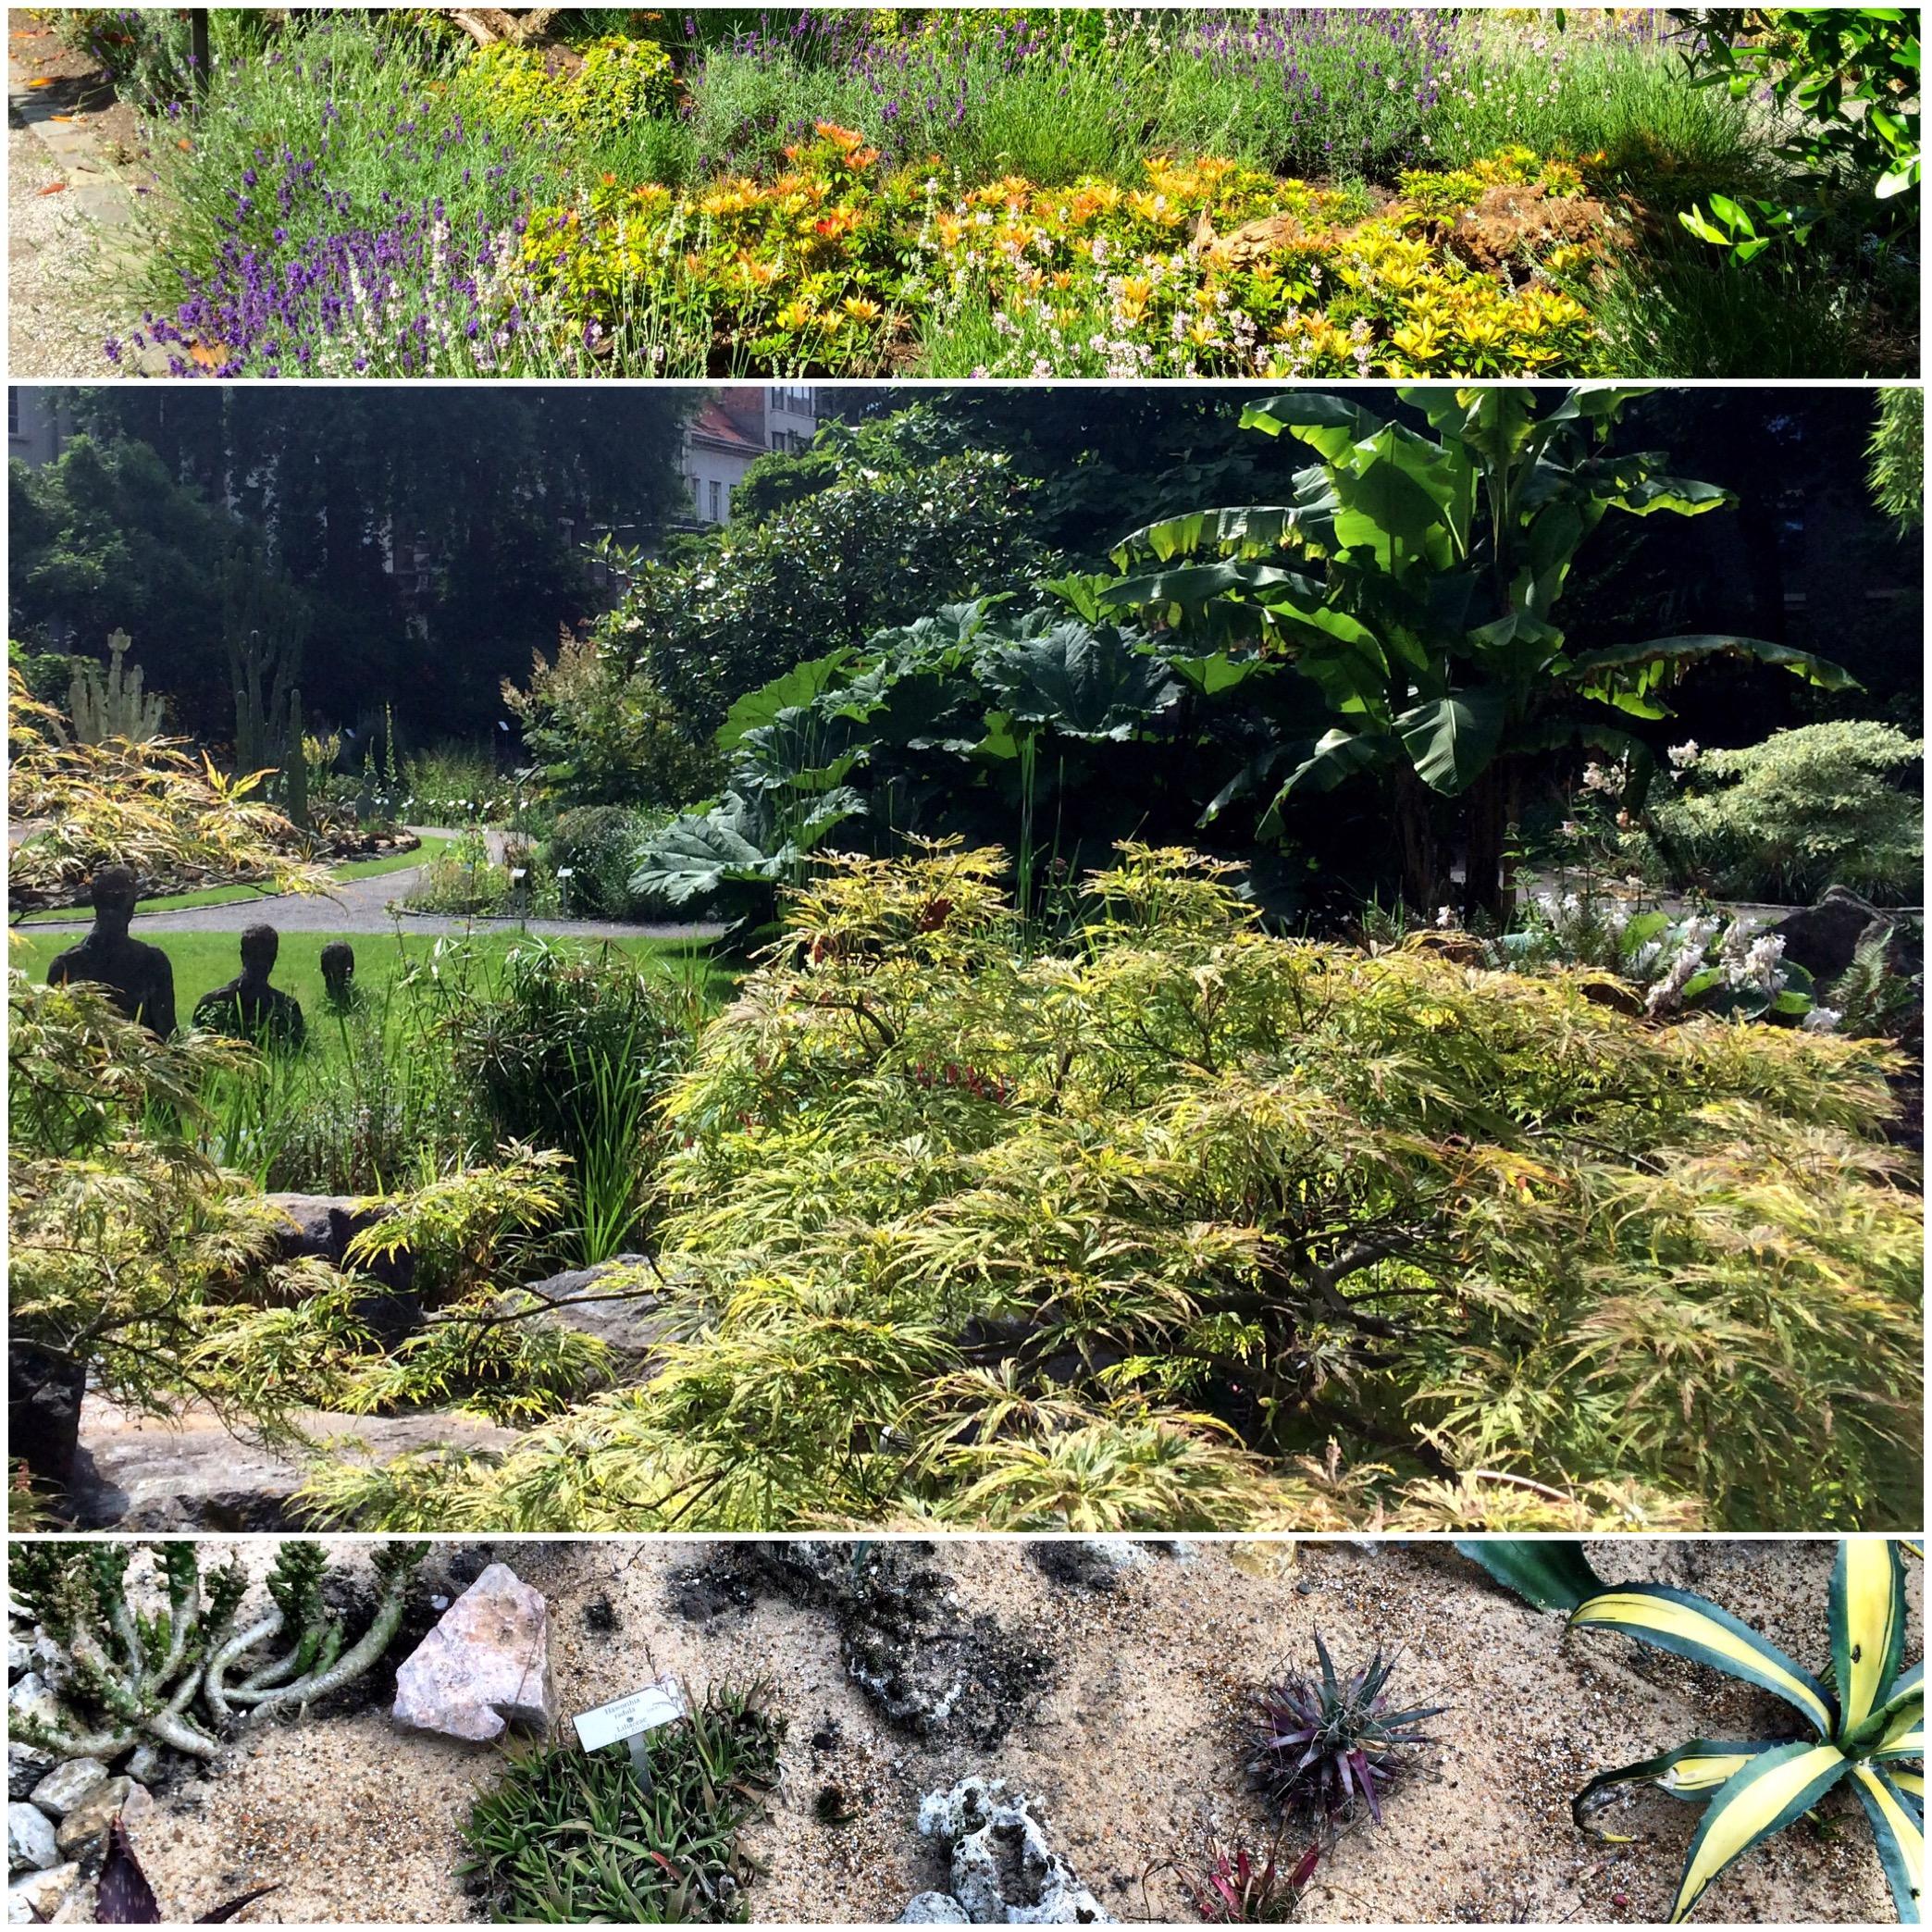 Visit : Antwerpu0027s Botanical Garden